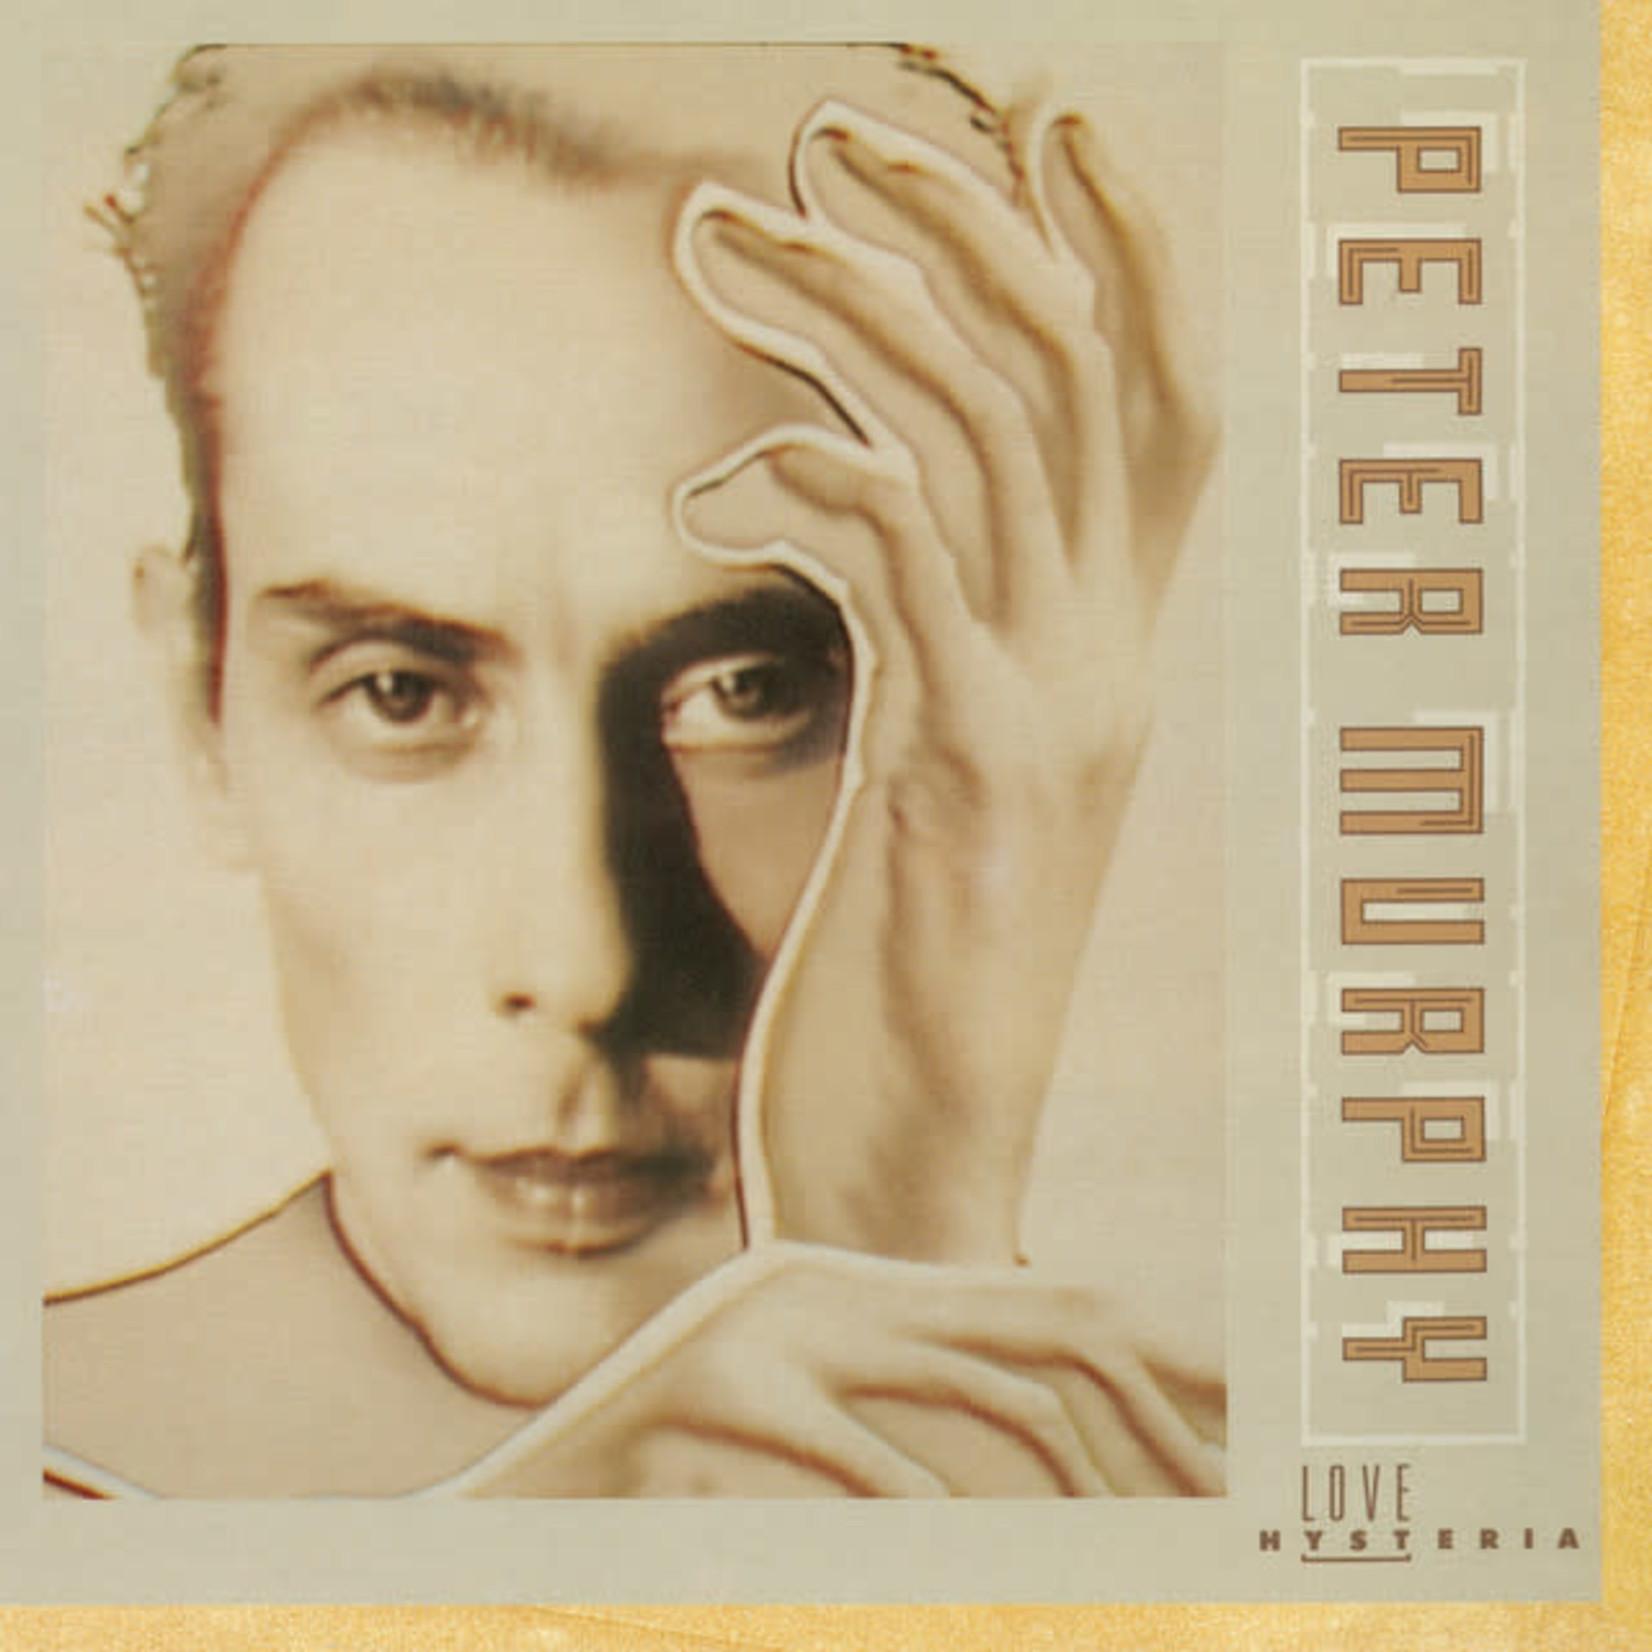 Vinyl Peter Murphy - Love Hysteria (Indigo Coloured Vinyl)